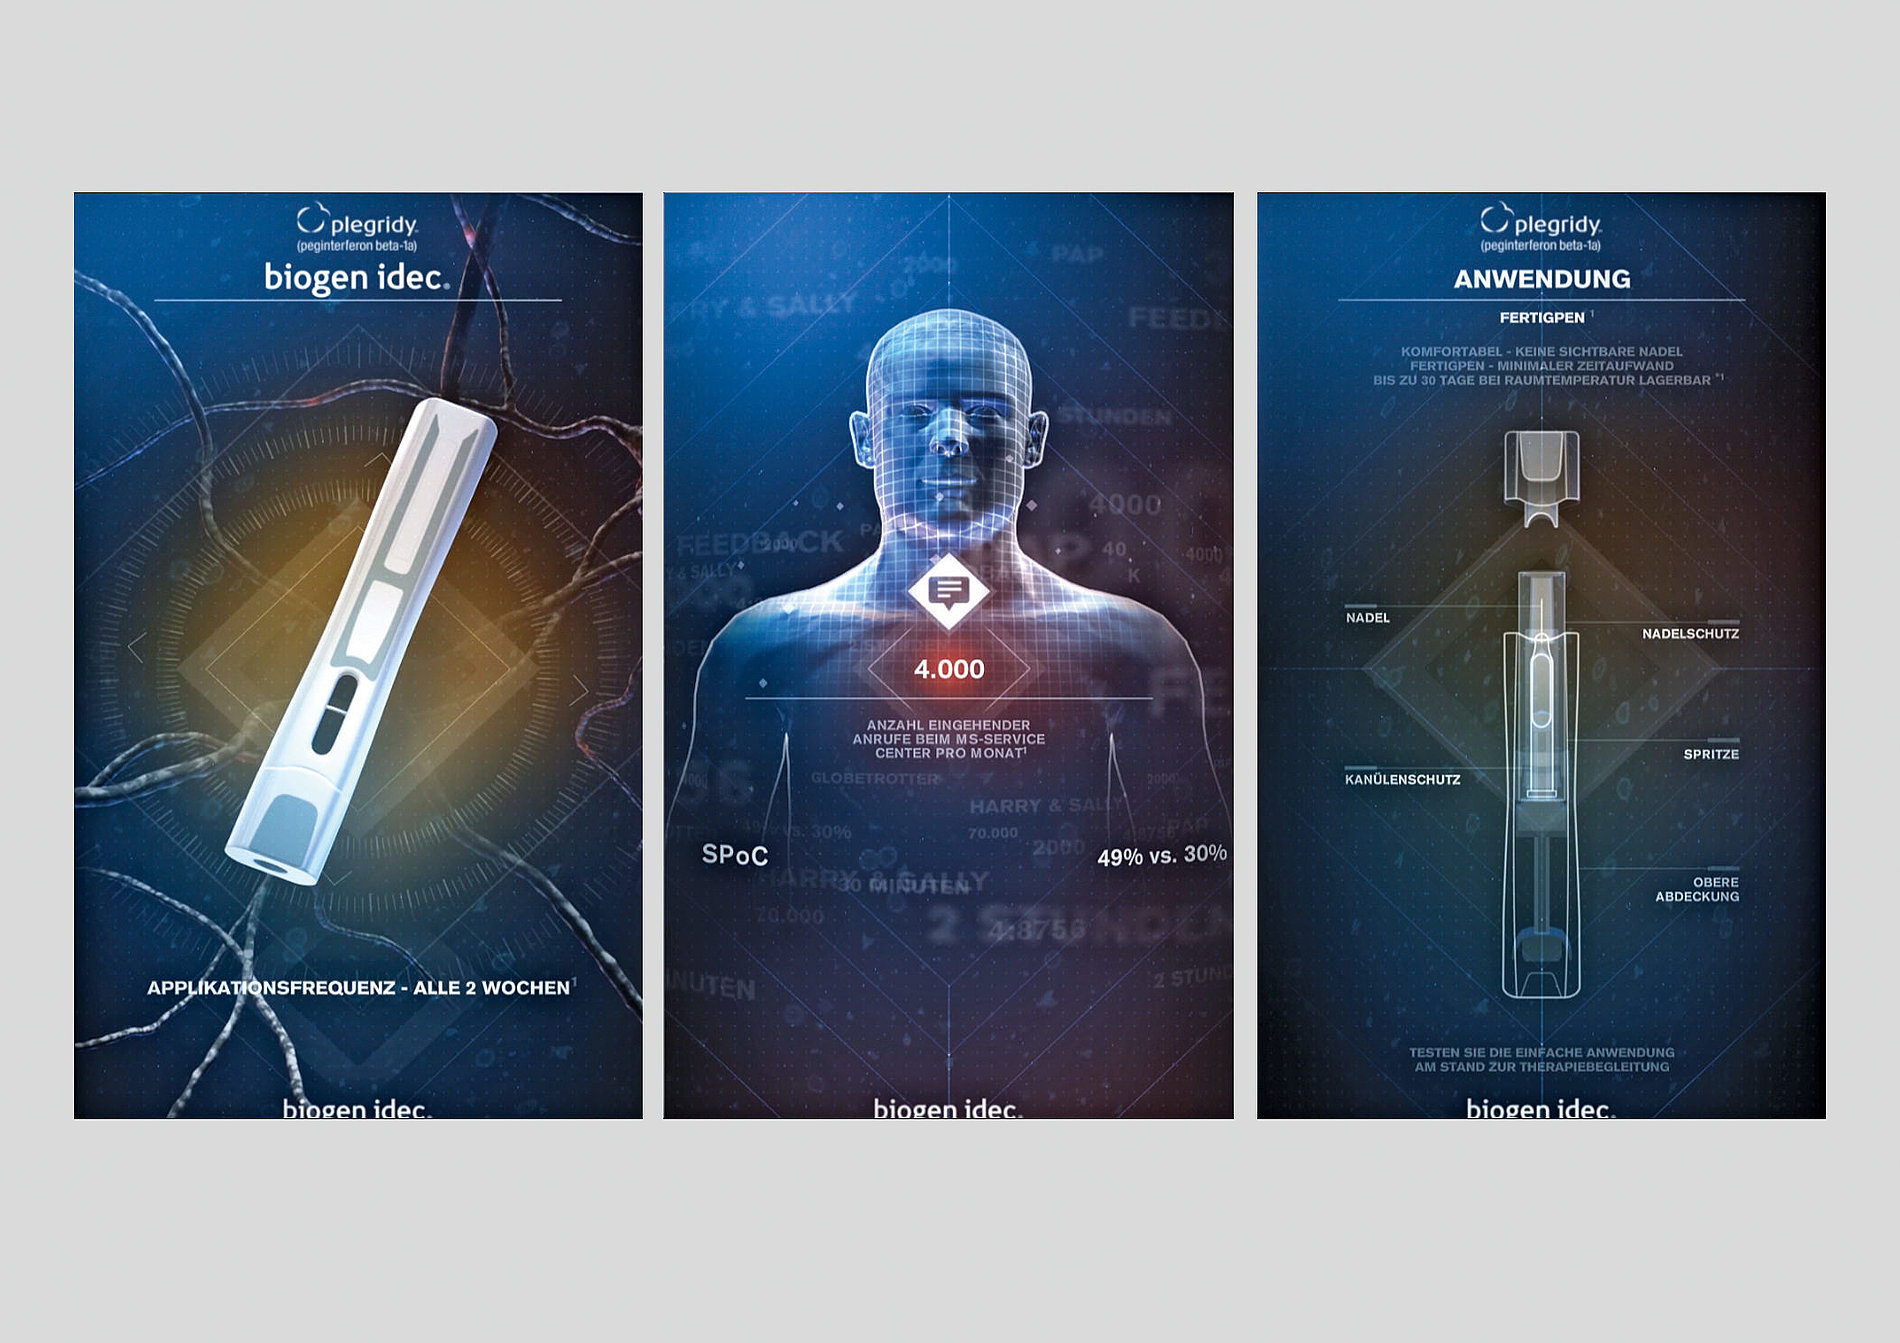 Biogen Idec | Red Dot Design Award